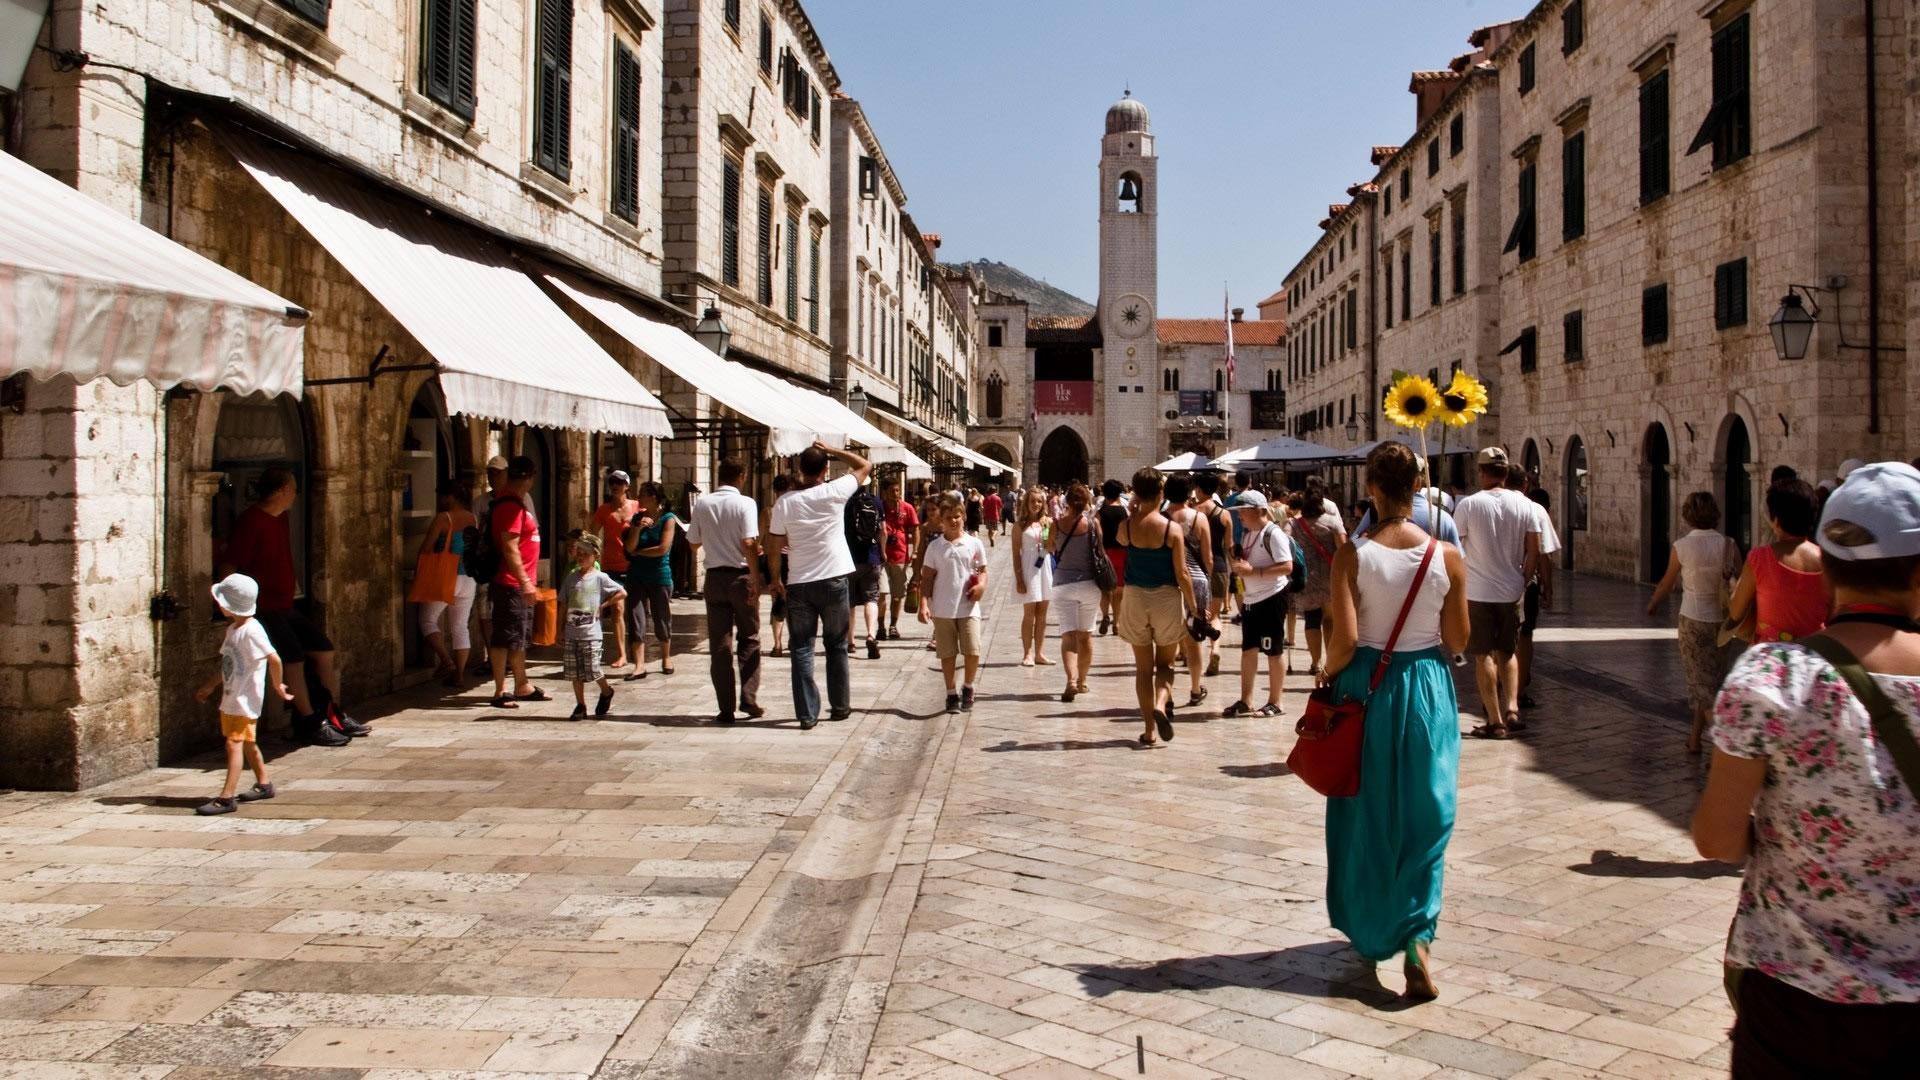 Dubrovnik Stradun Street City Lifeline Split Croatia Travel Guide